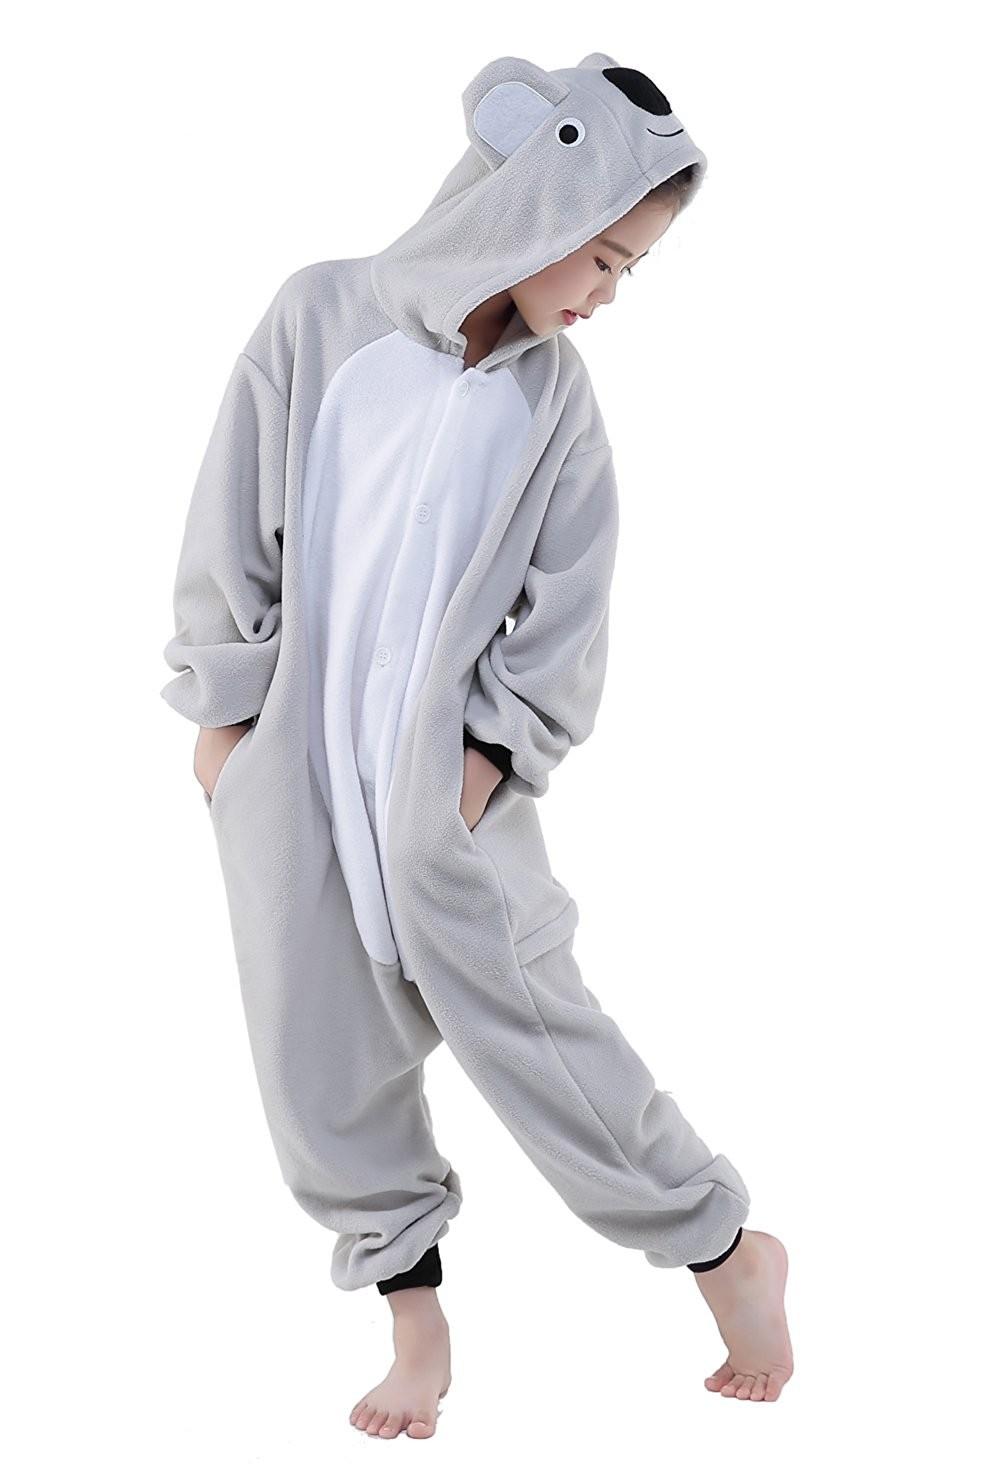 Koala Onesie Kids Kigurumi Polar Fleece For Kids